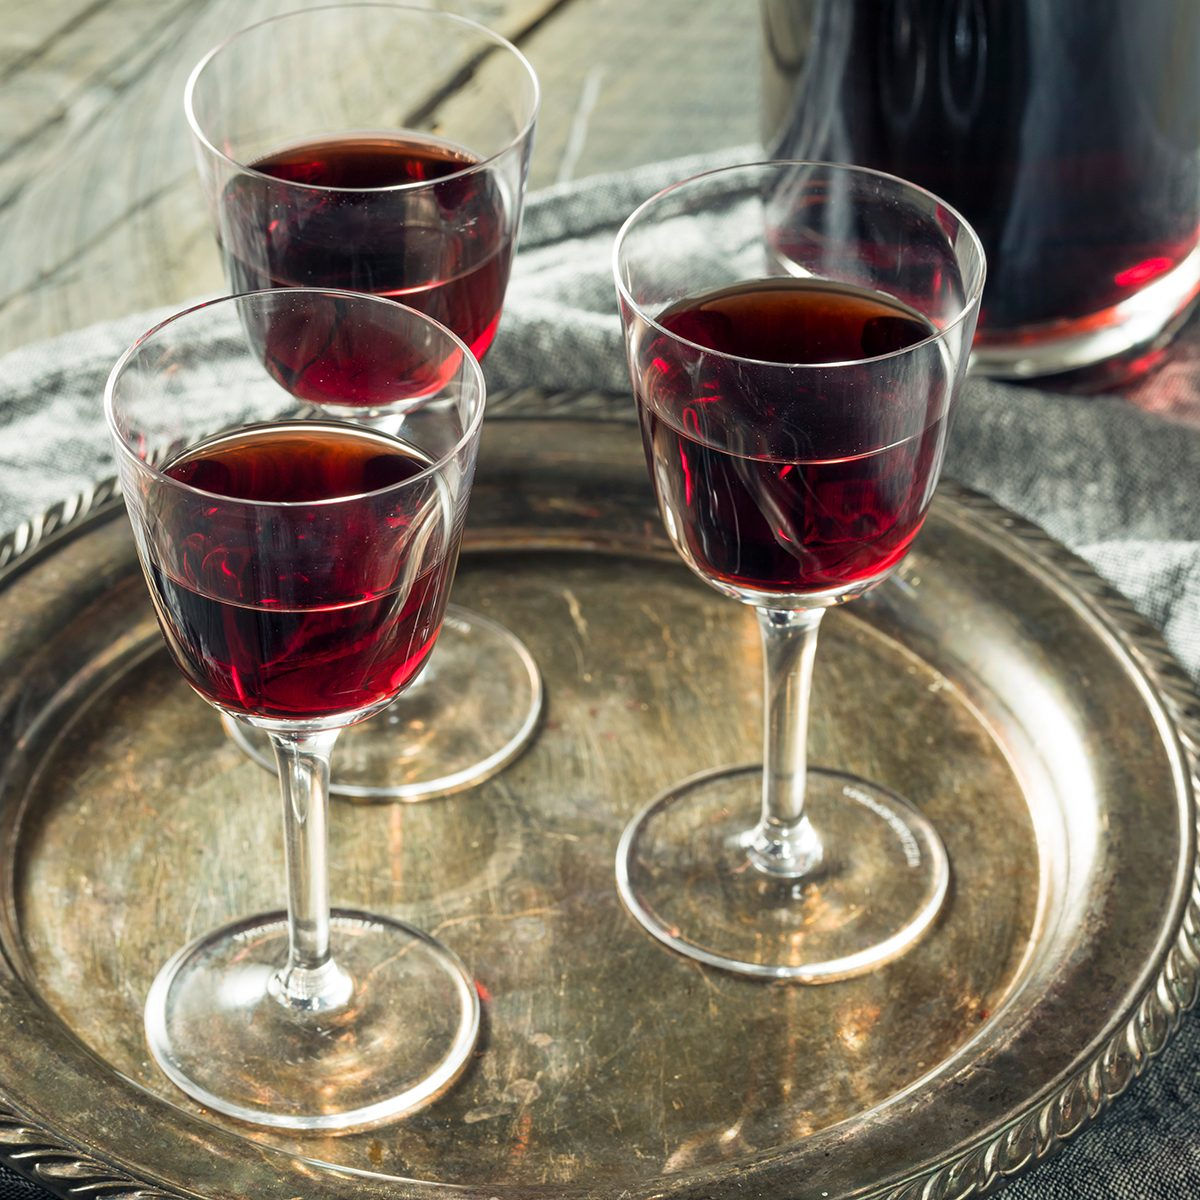 Sweet Port Dessert Wine ready to Drink